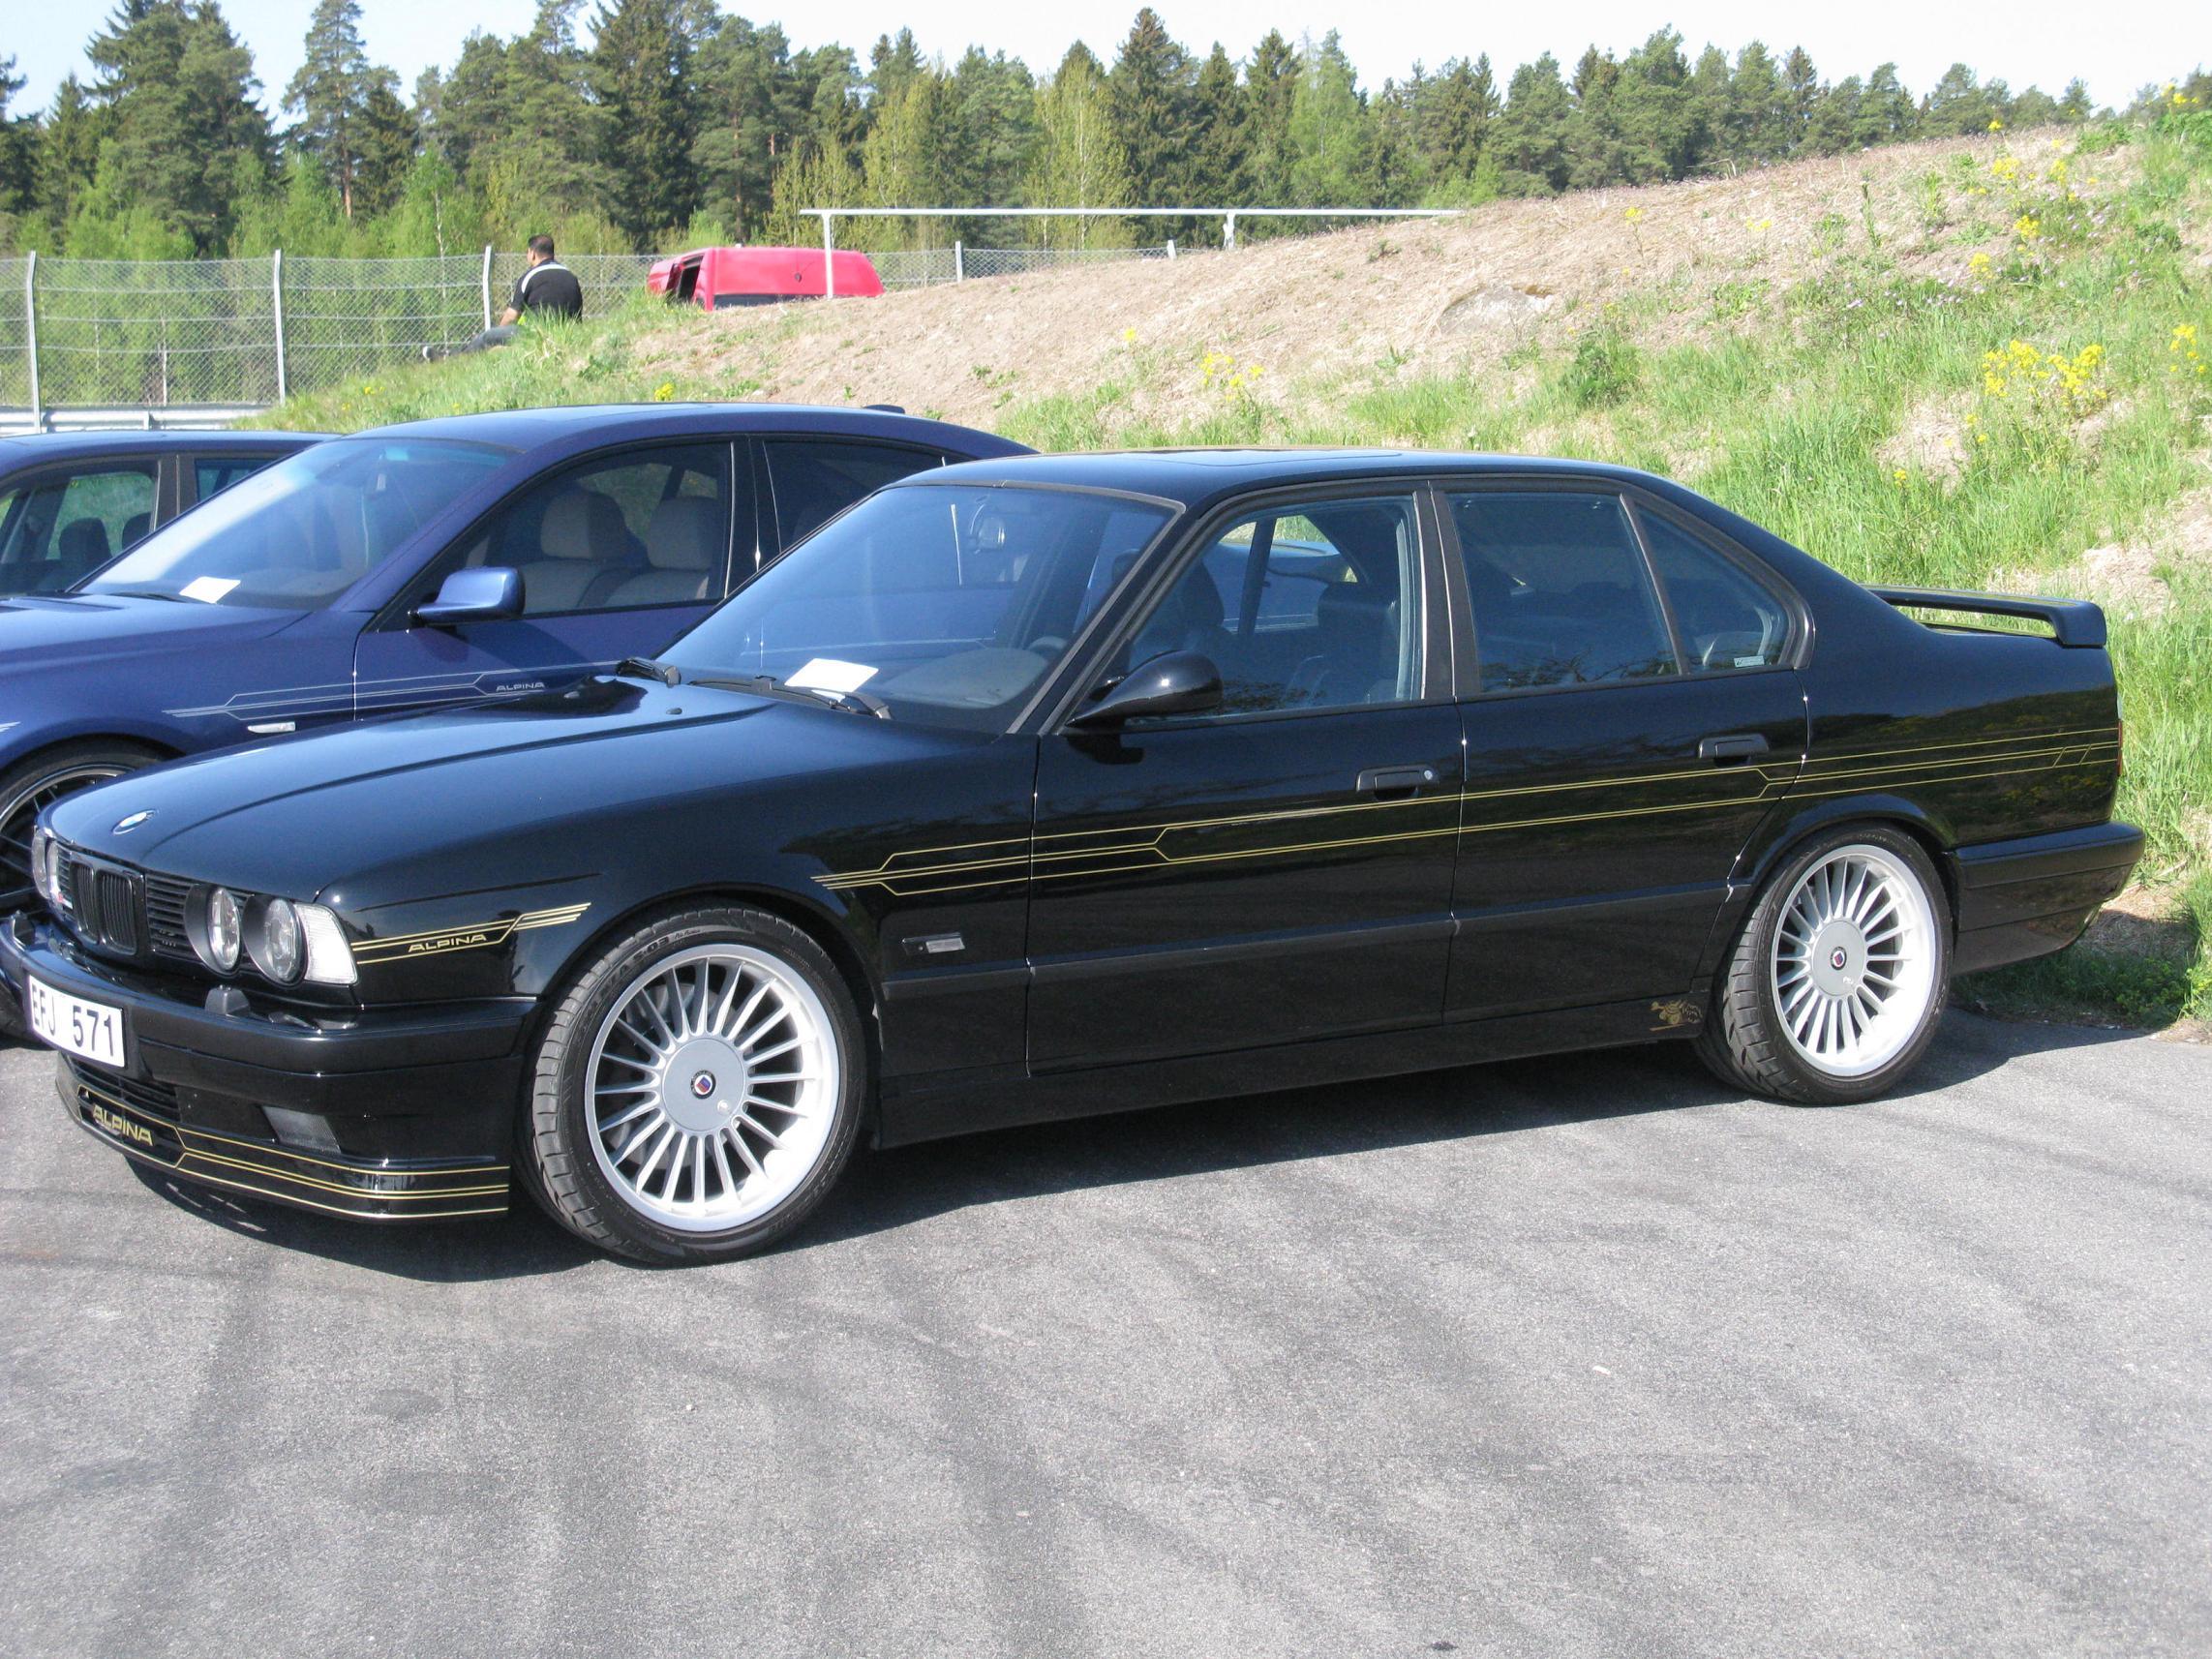 Bmw Rims Style >> File:BMW Alpina B10 Biturbo E34 (5701043210).jpg ...